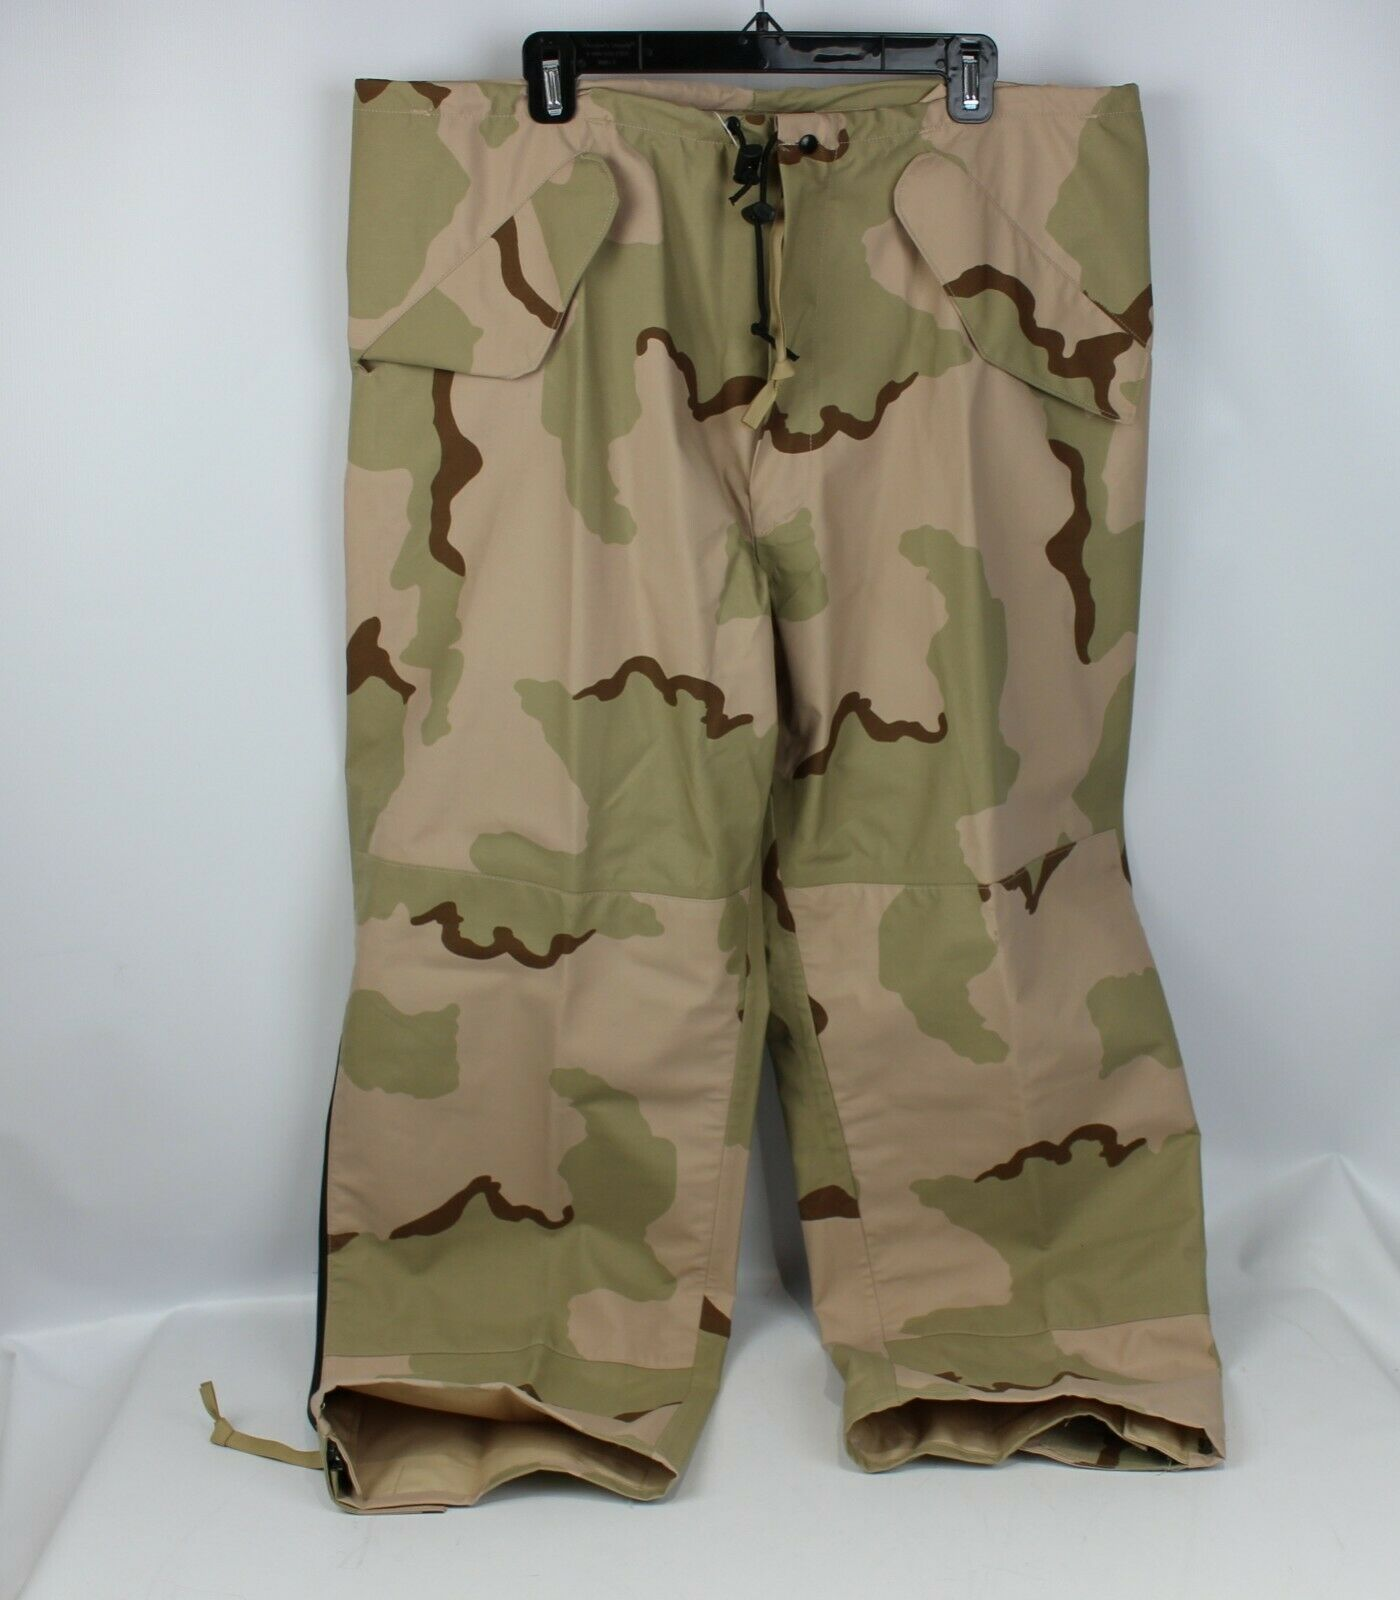 EUC Desert Camo DCU Gore-tex Wet Weather Trousers Goretex Pants, Waterproof